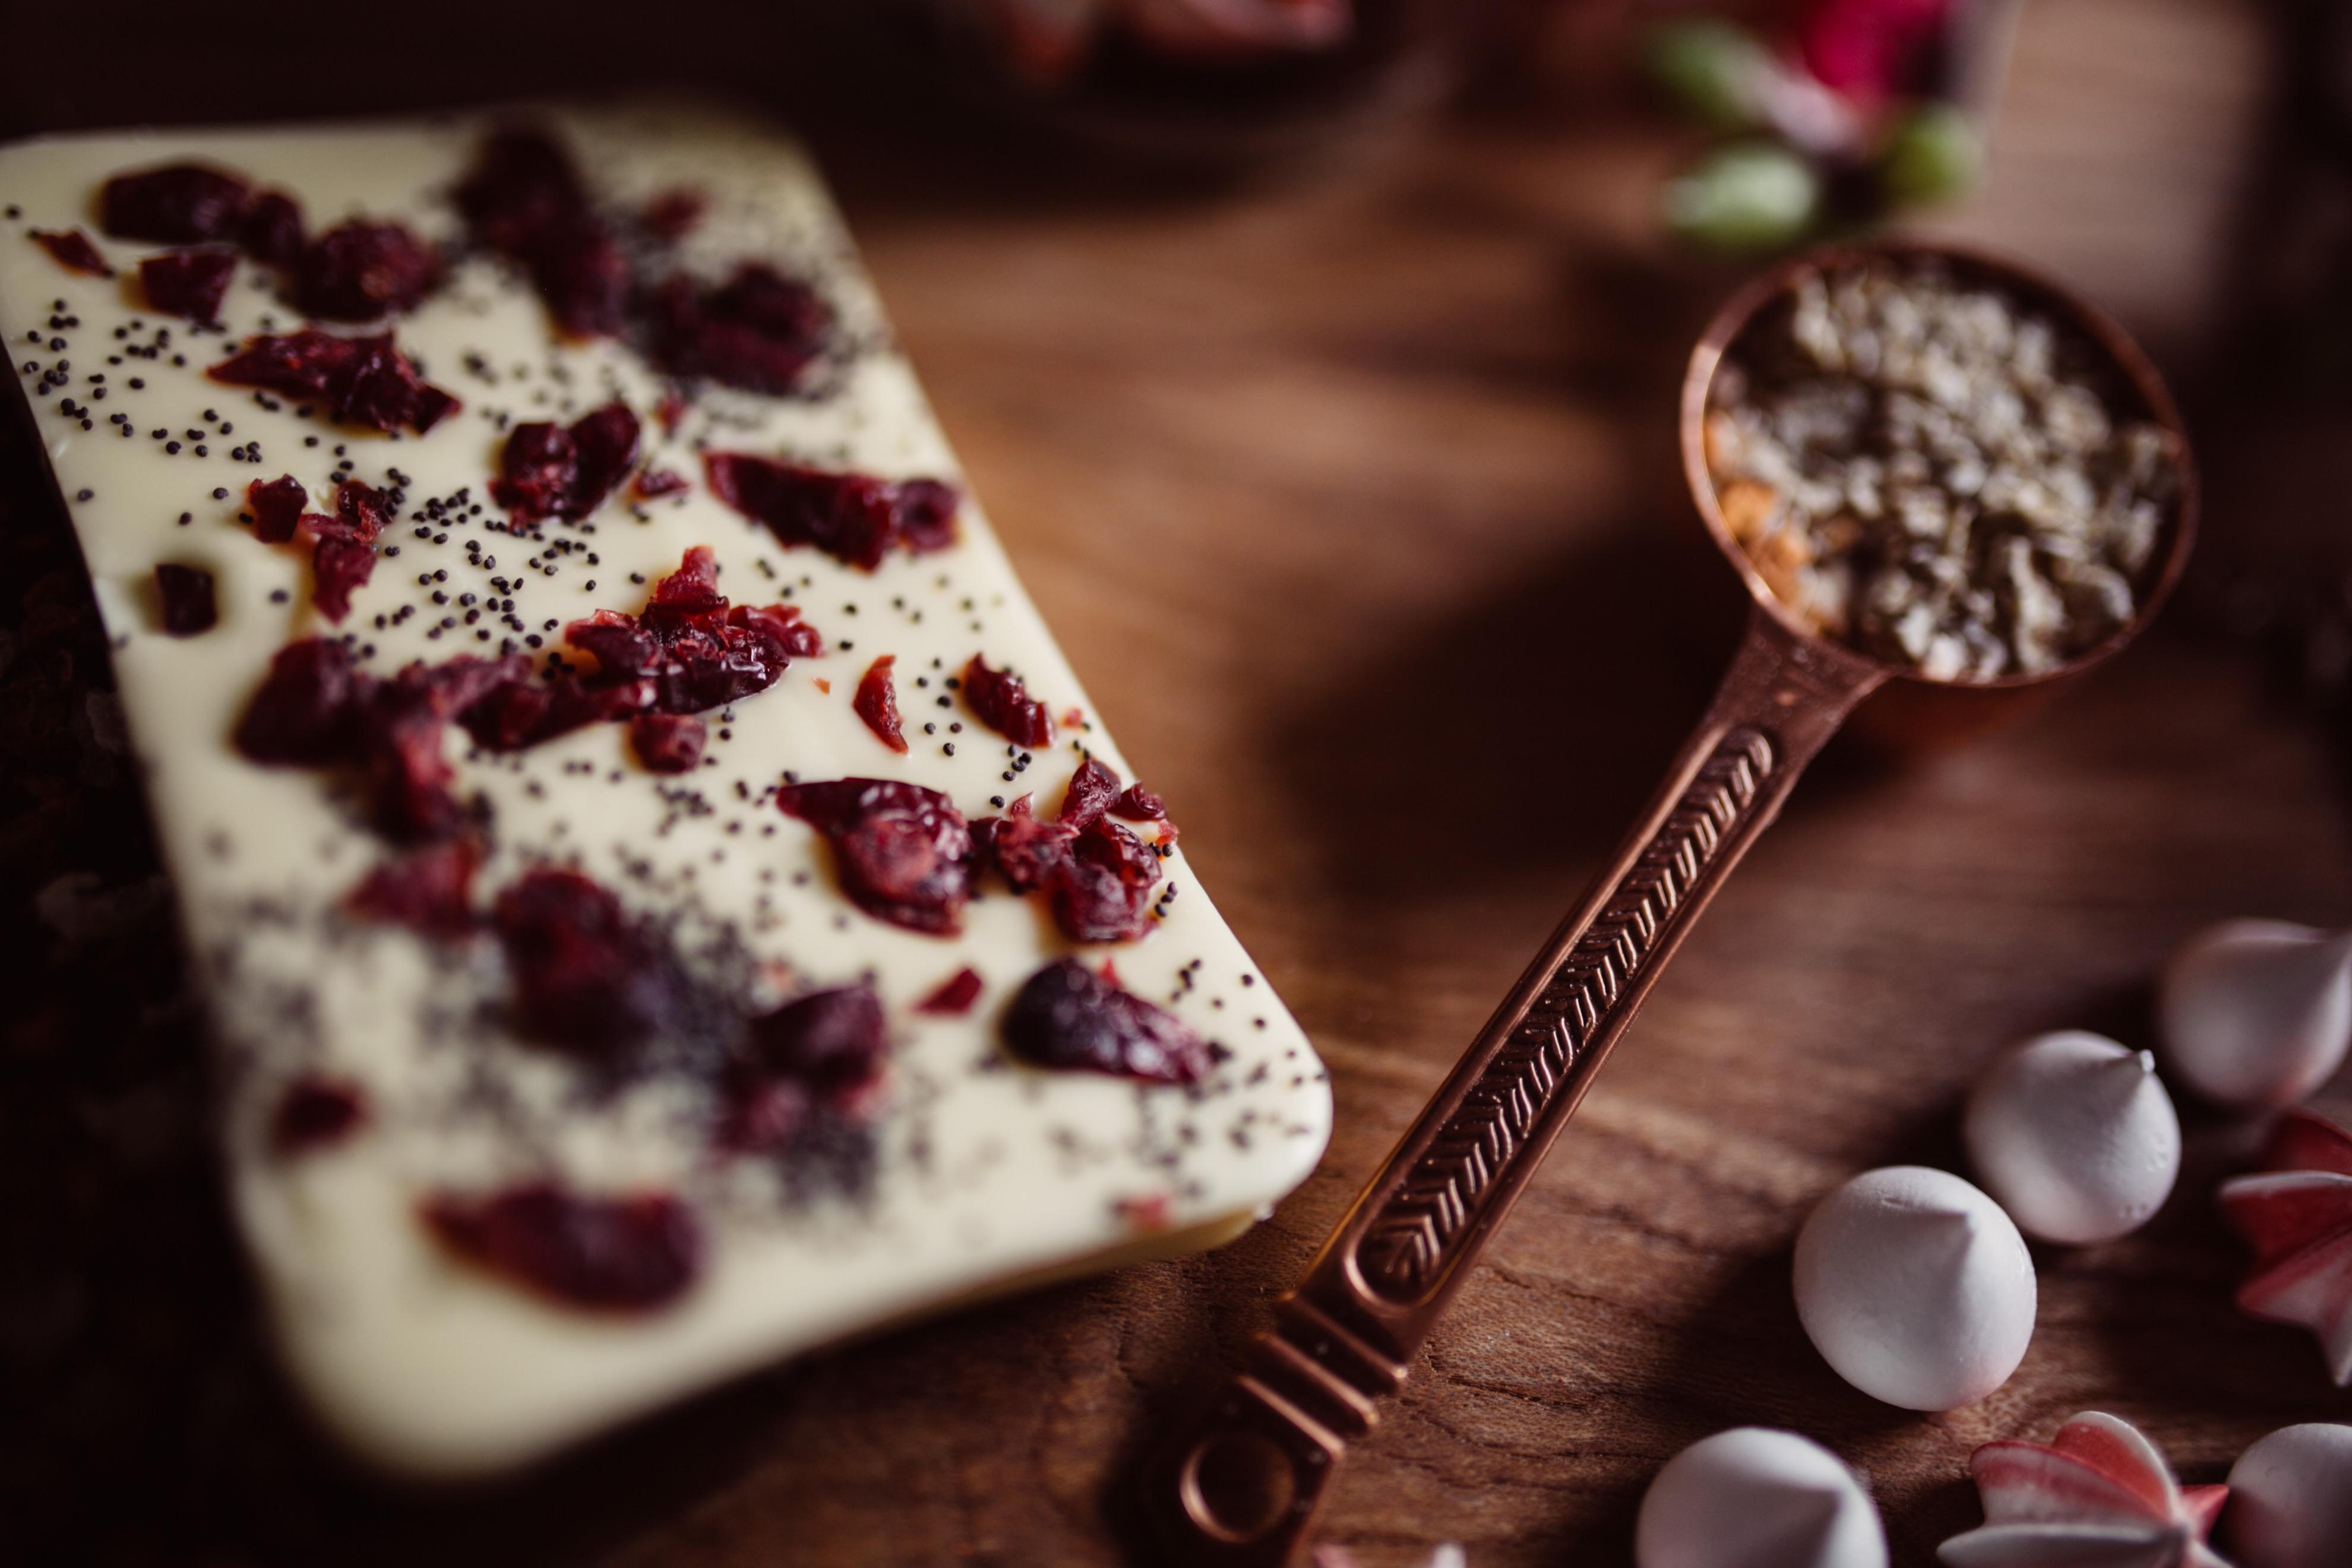 Cranberry and Poppy Seed chocolate - Rosetta D'Uva Sweet Folie